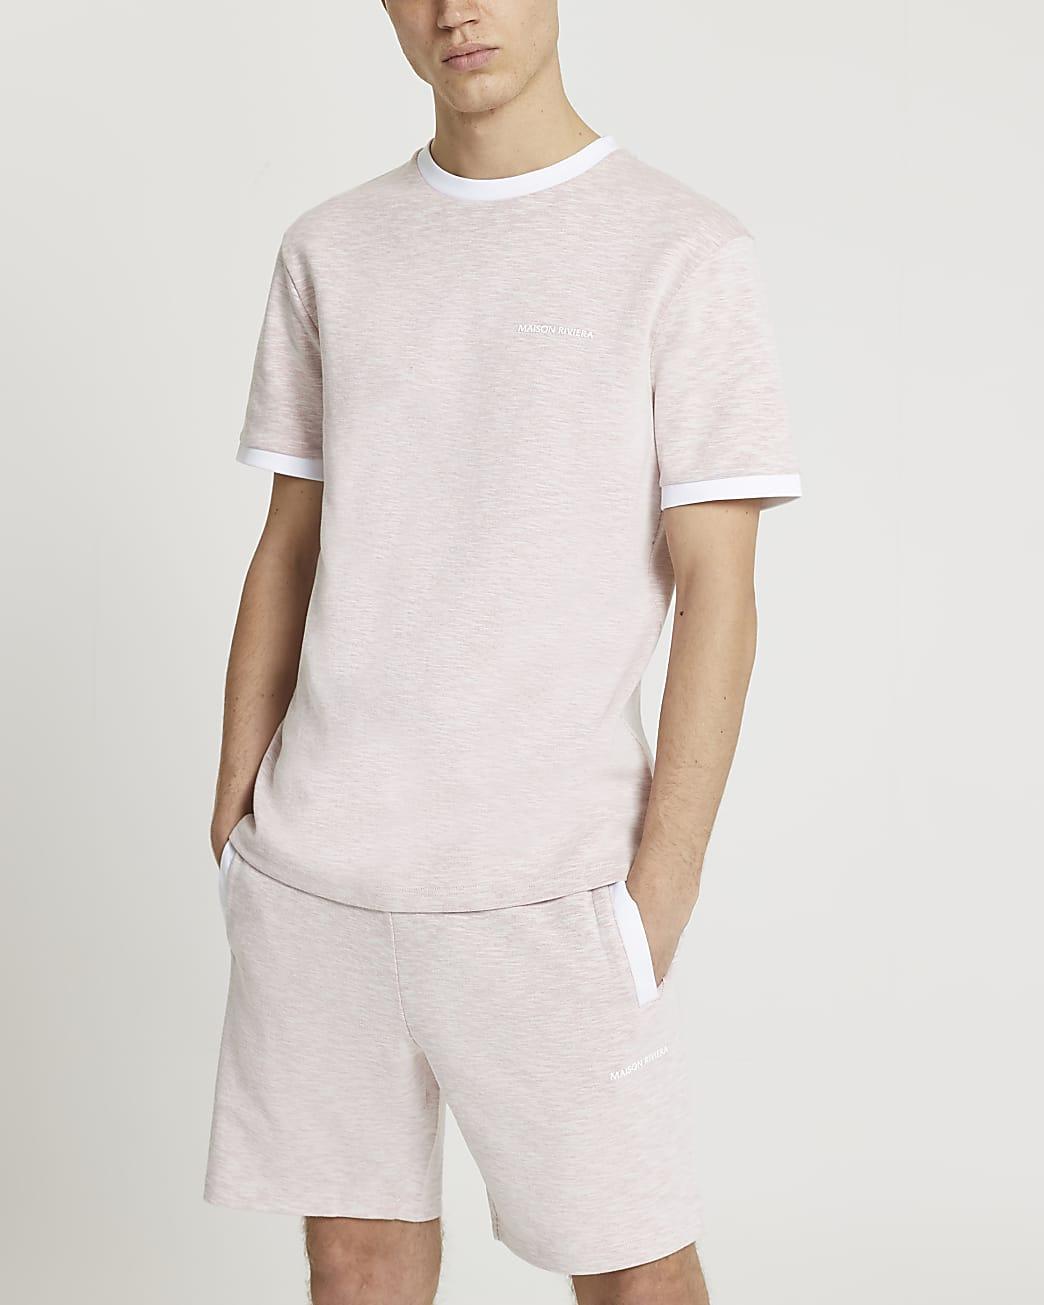 Maison Riviera pink slim space dye t-shirt